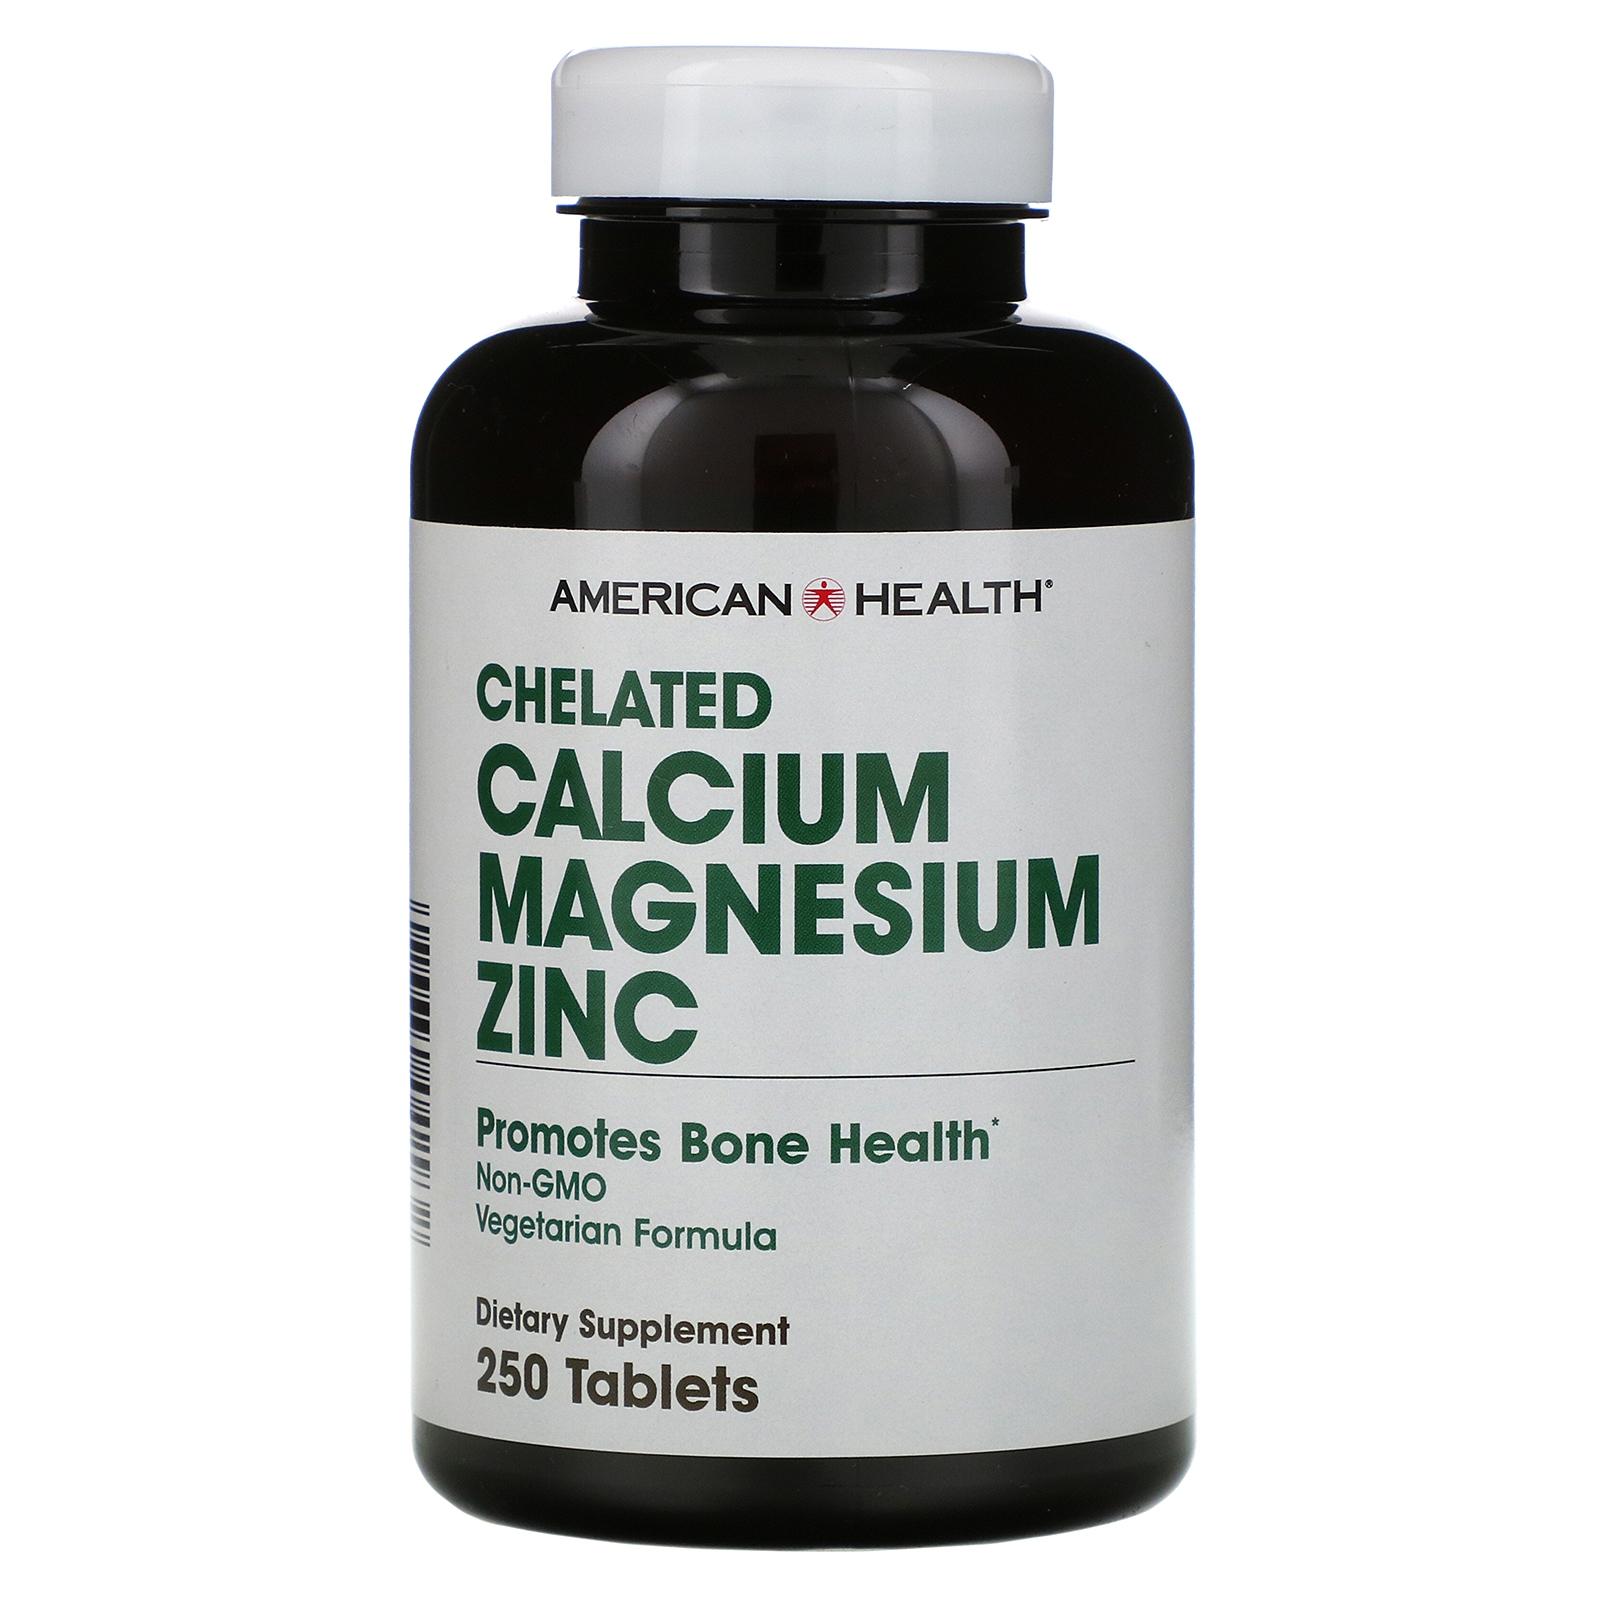 Chelated Calcium Magnesium Zinc (250 tablets) American Health